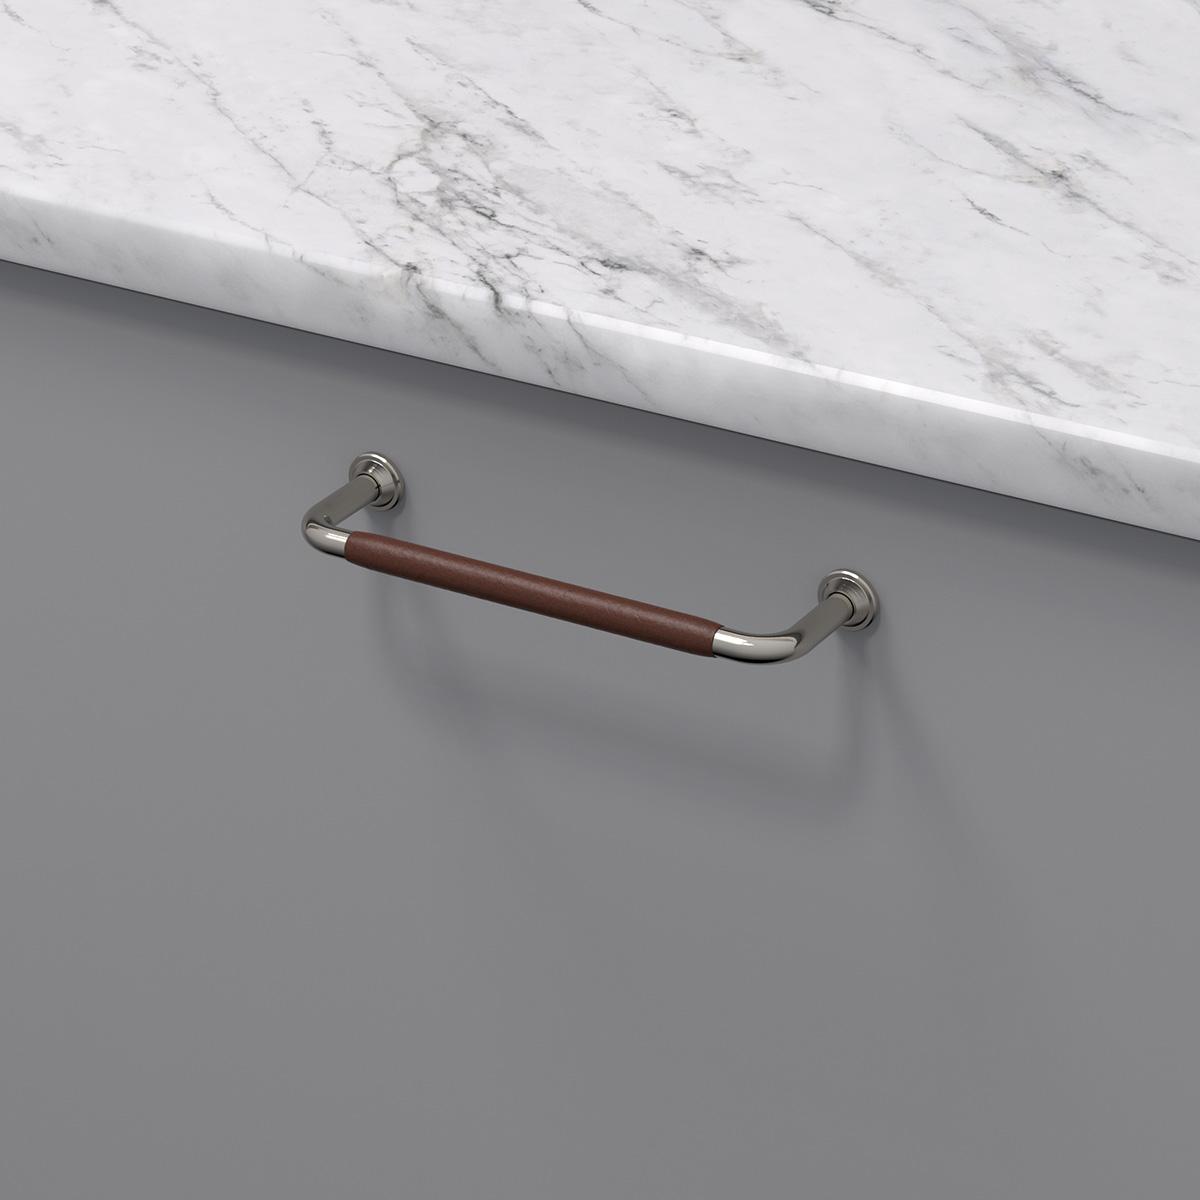 Handtag 1353 ladersvept fornicklad brun 330741 11 cc 128 mm ncs s 4500 n marmor carrara